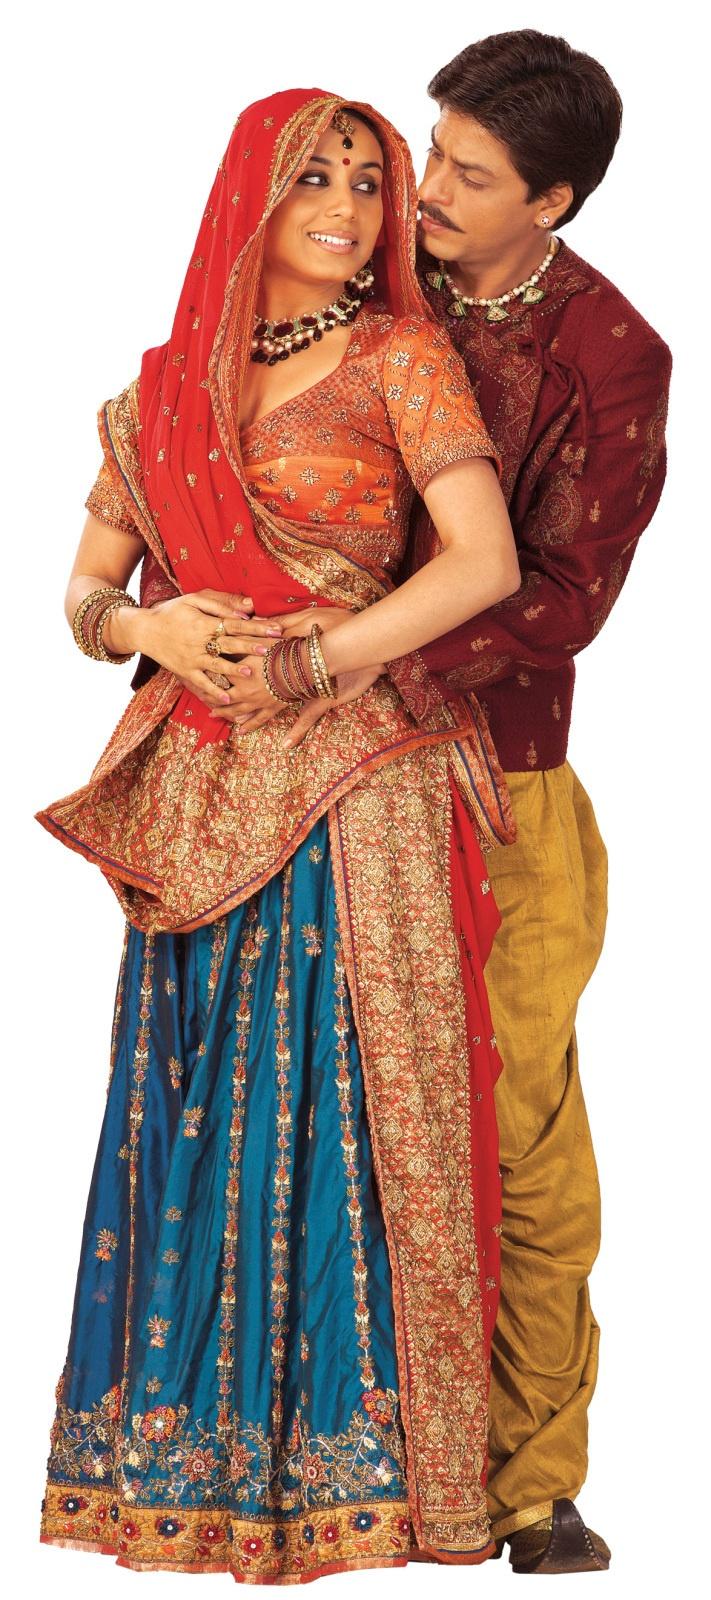 Paheli <3 <3 love this movie